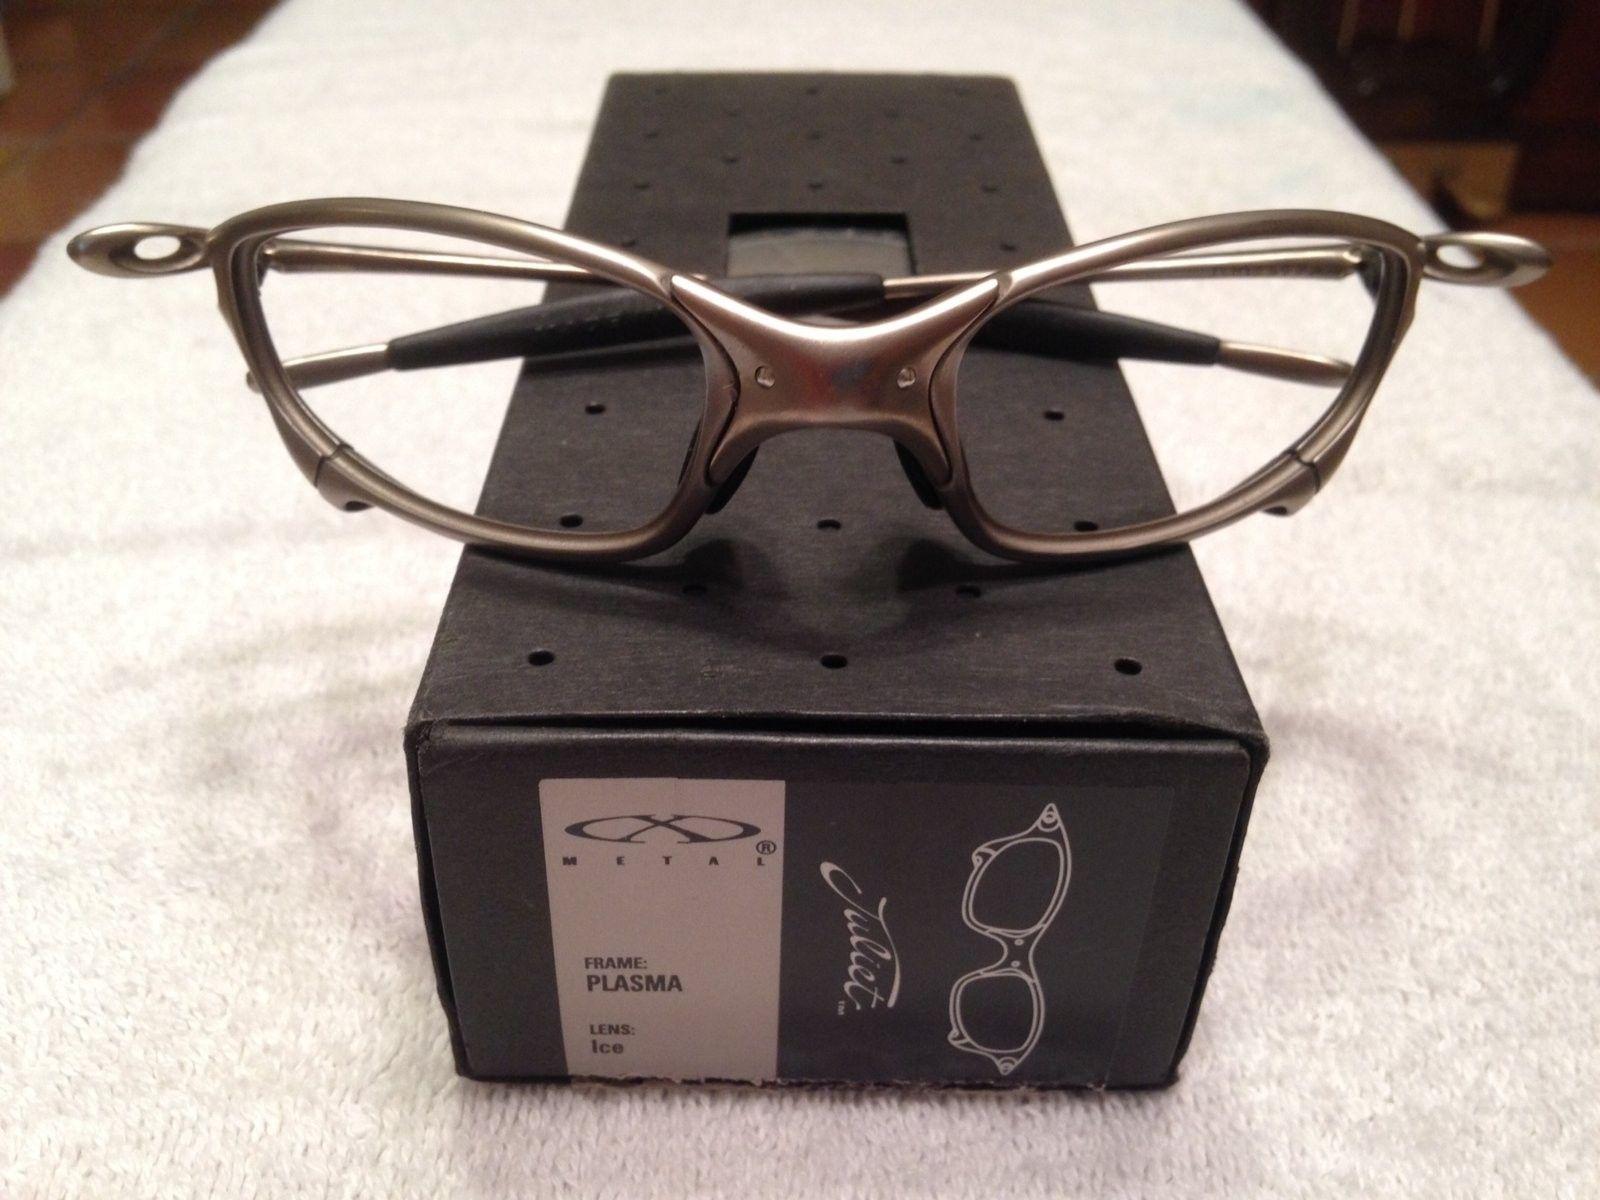 2nd gen Plasma/Ice Juliet w/ Matching Box - $250 OBO - IMG_1137.JPG